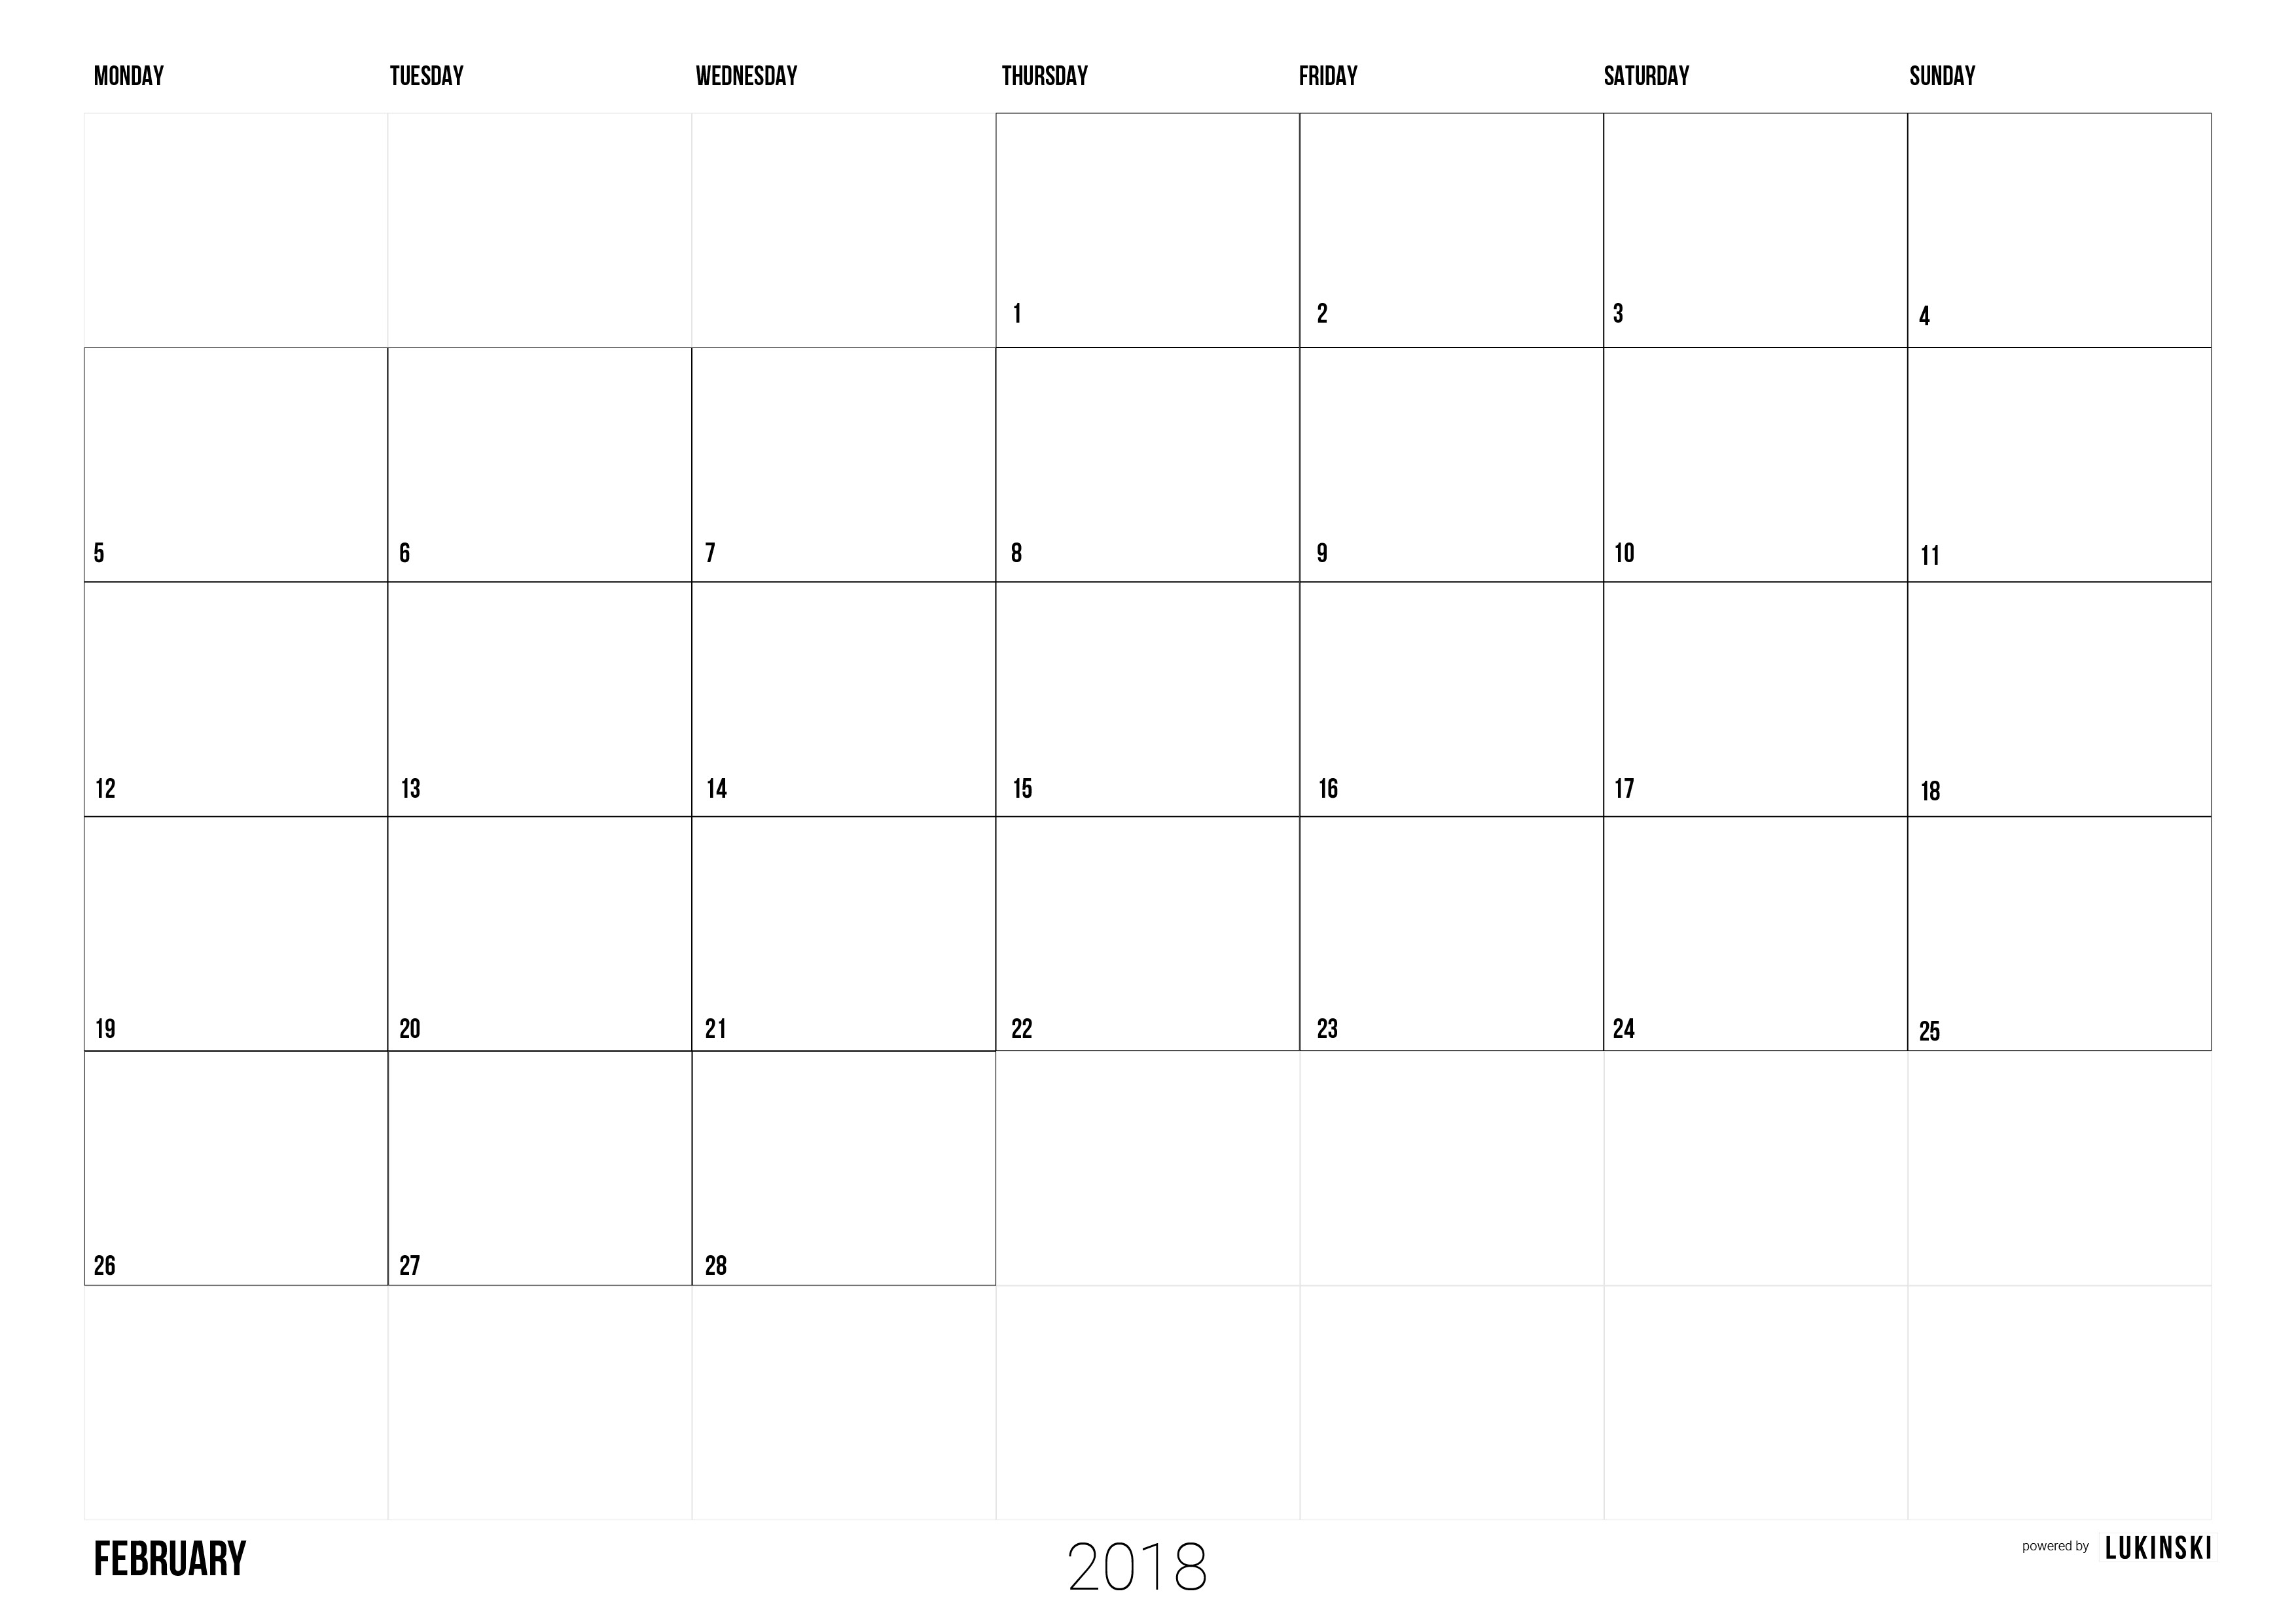 calendar 2018 to print pdf monthly calendar free for team and